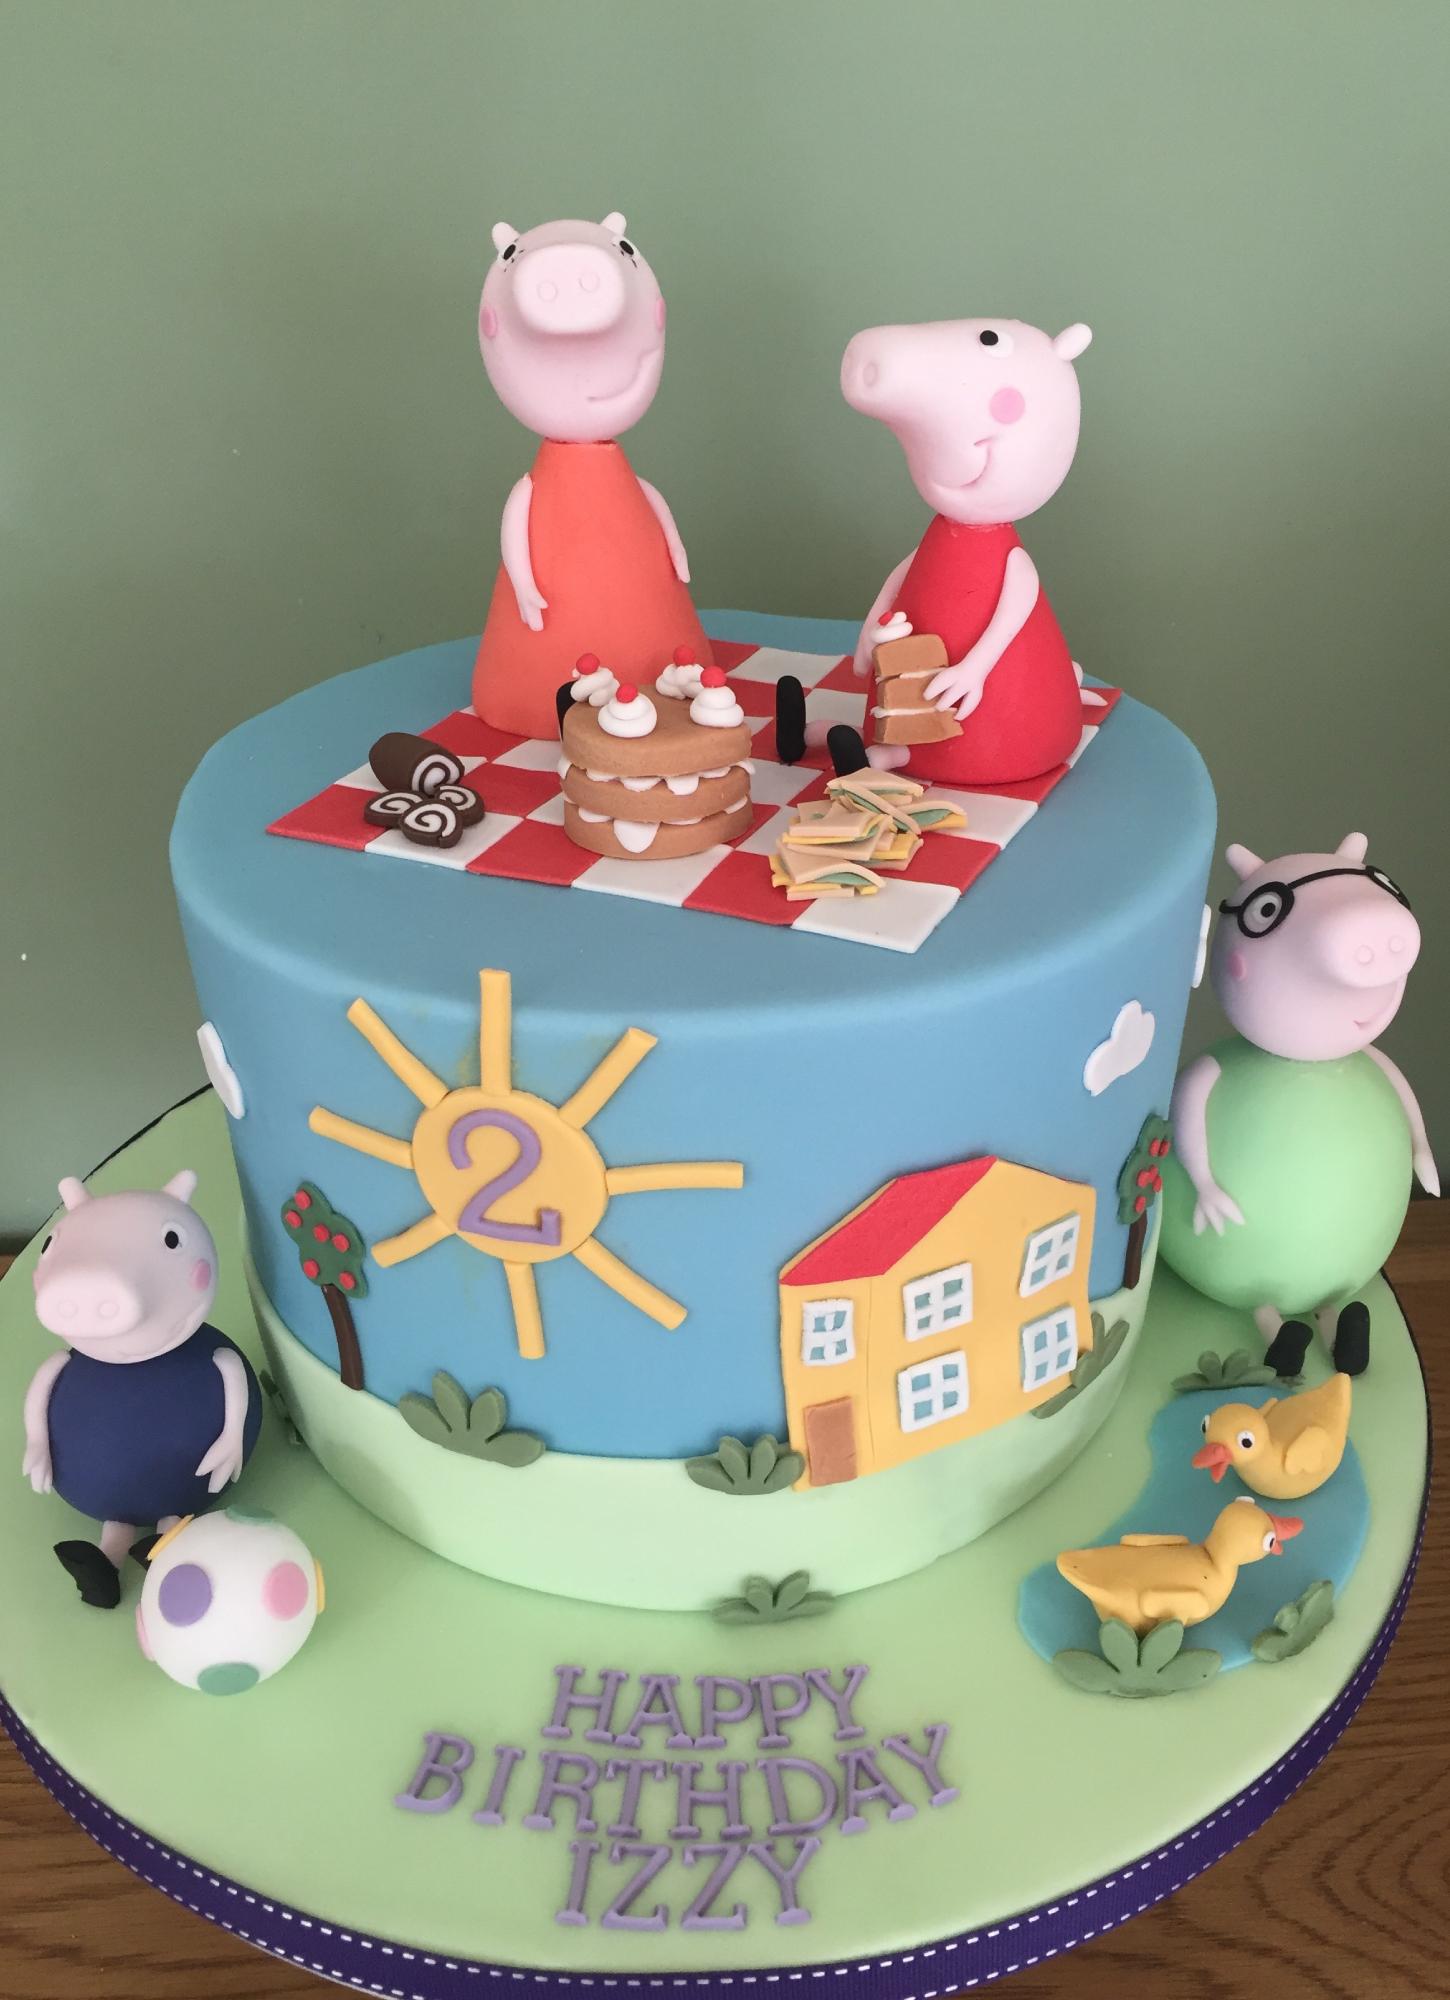 Bespoke Children's Birthday Cake - Pat a Cakes Jersey